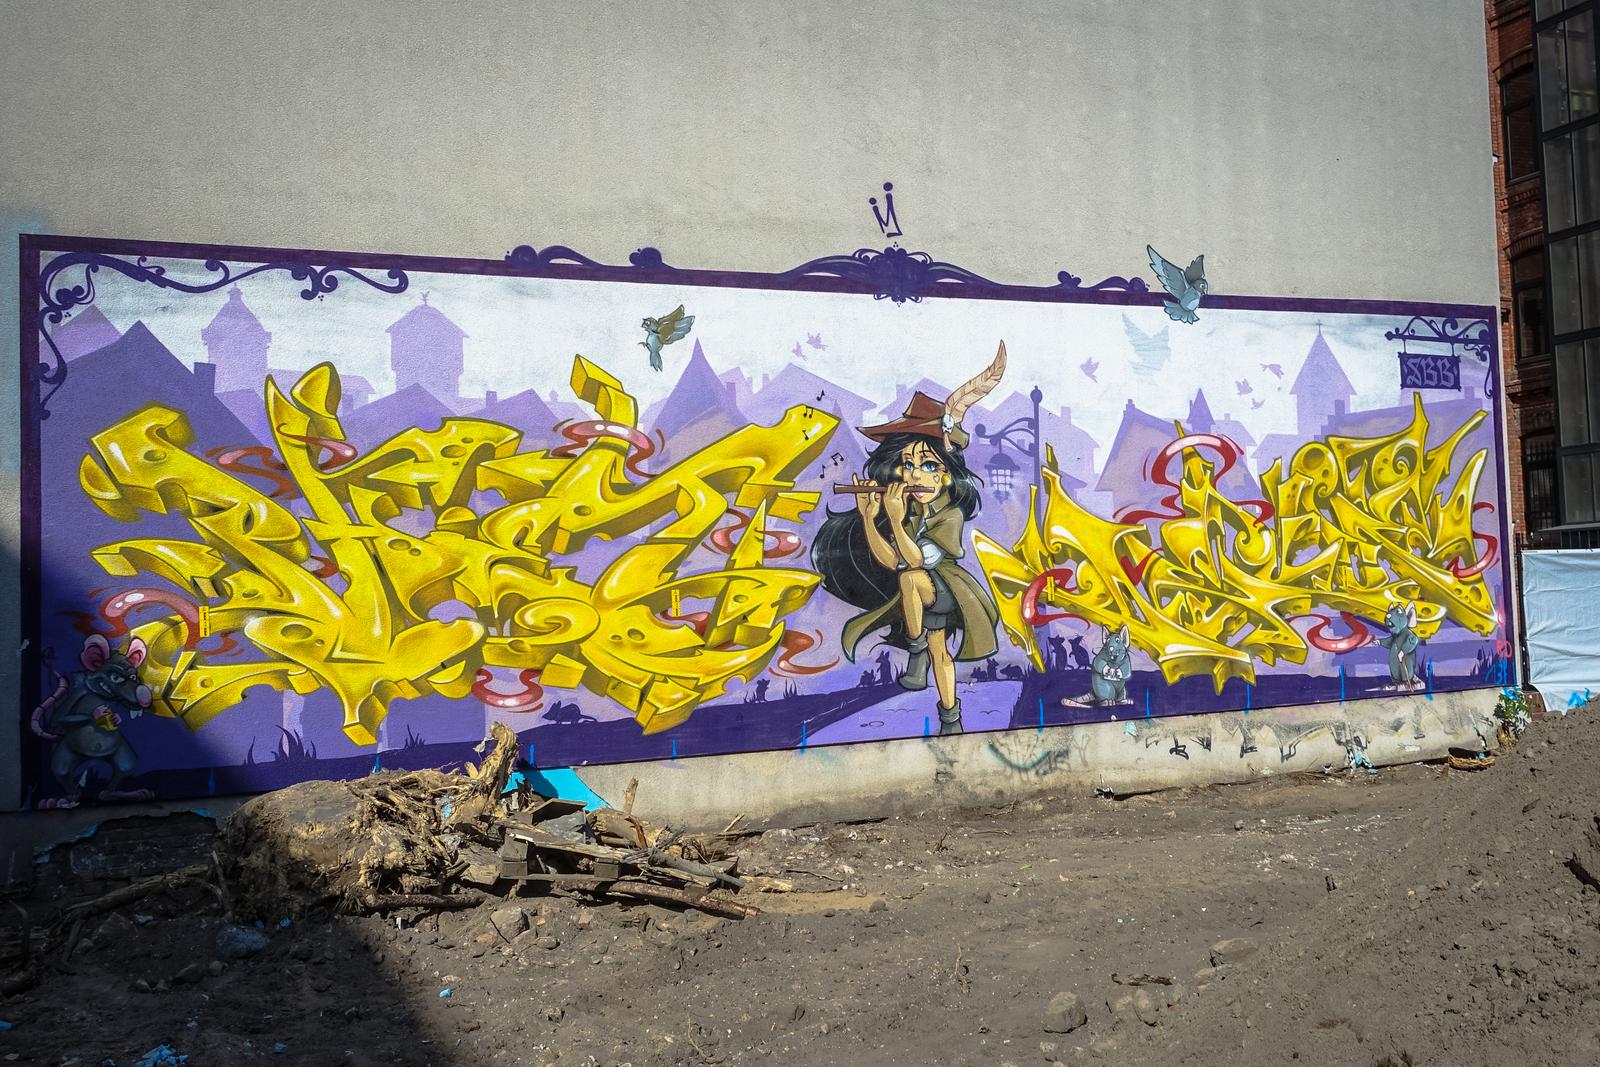 graffiti dejoe phet orbit sbb berlin mitte r ckertstra urbanpresents. Black Bedroom Furniture Sets. Home Design Ideas